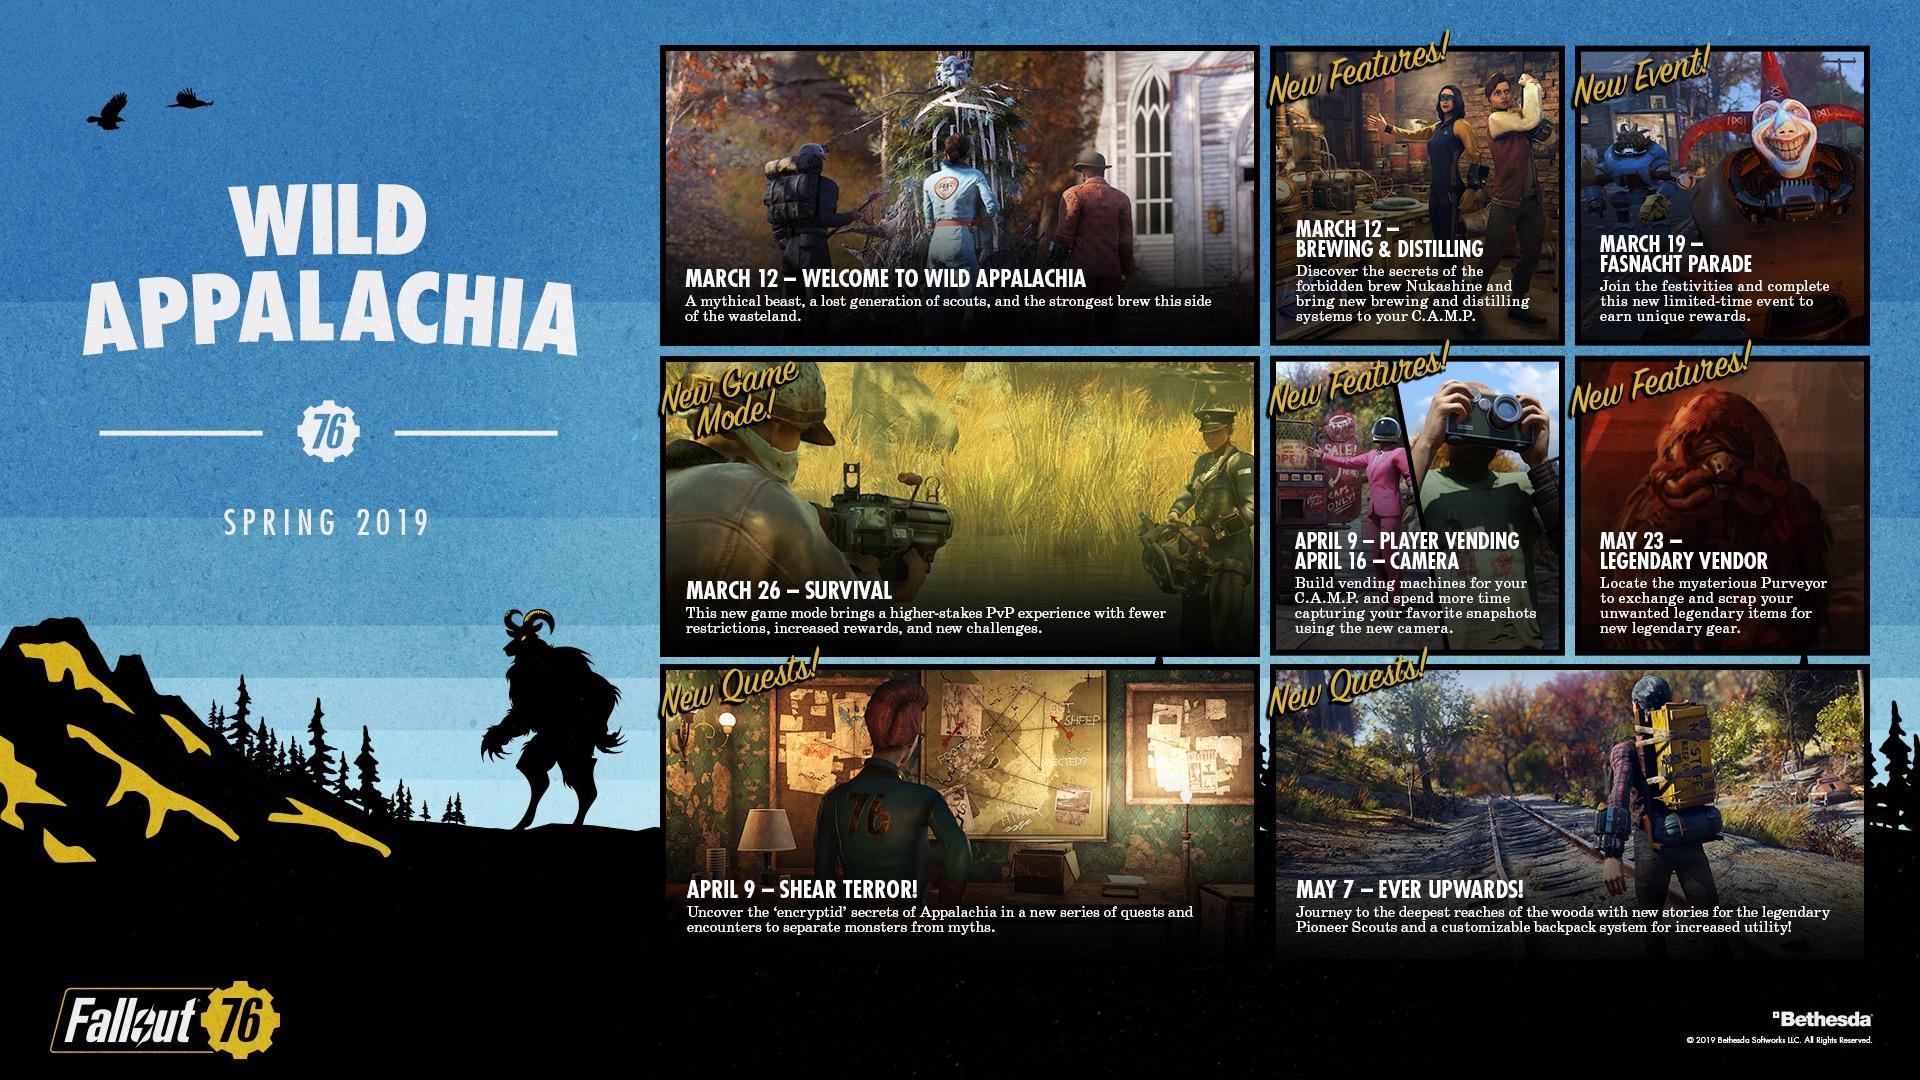 Fallout76_WildAppalachia_Roadmap_FINAL.j